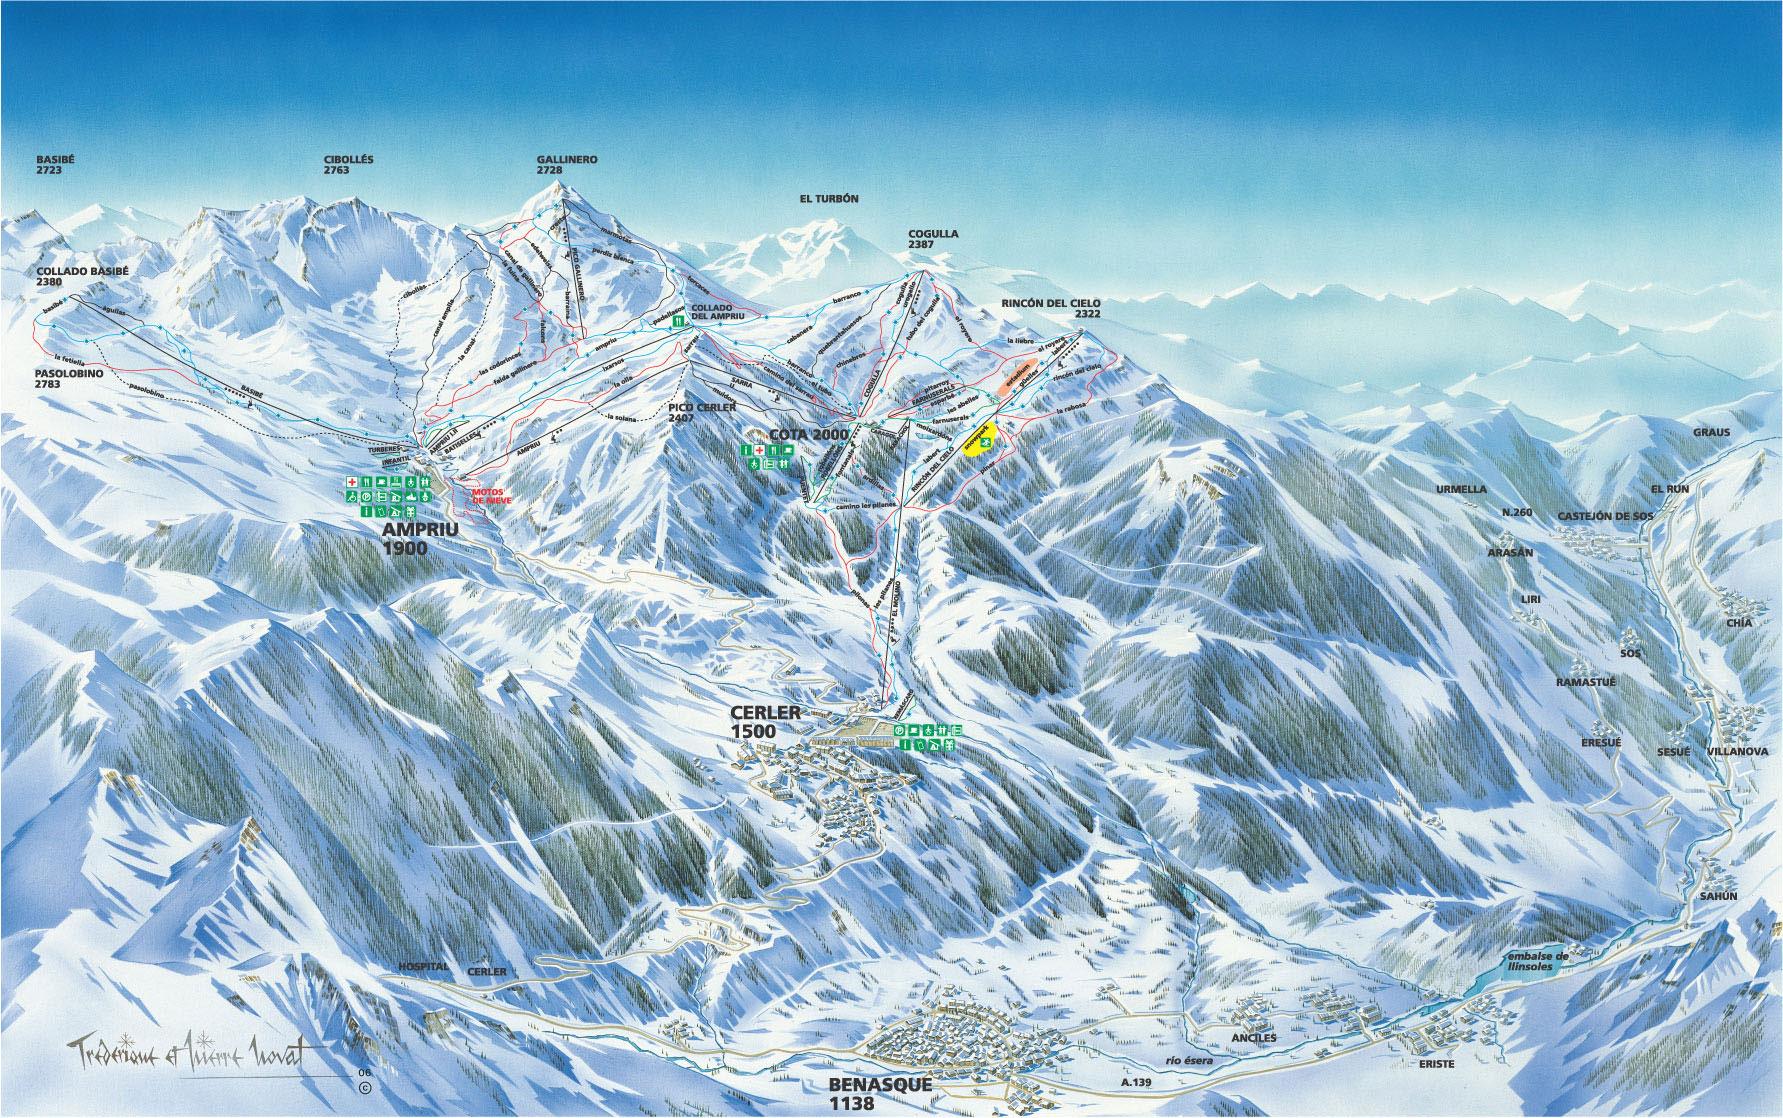 estaciones de esqui pirineo aragones: